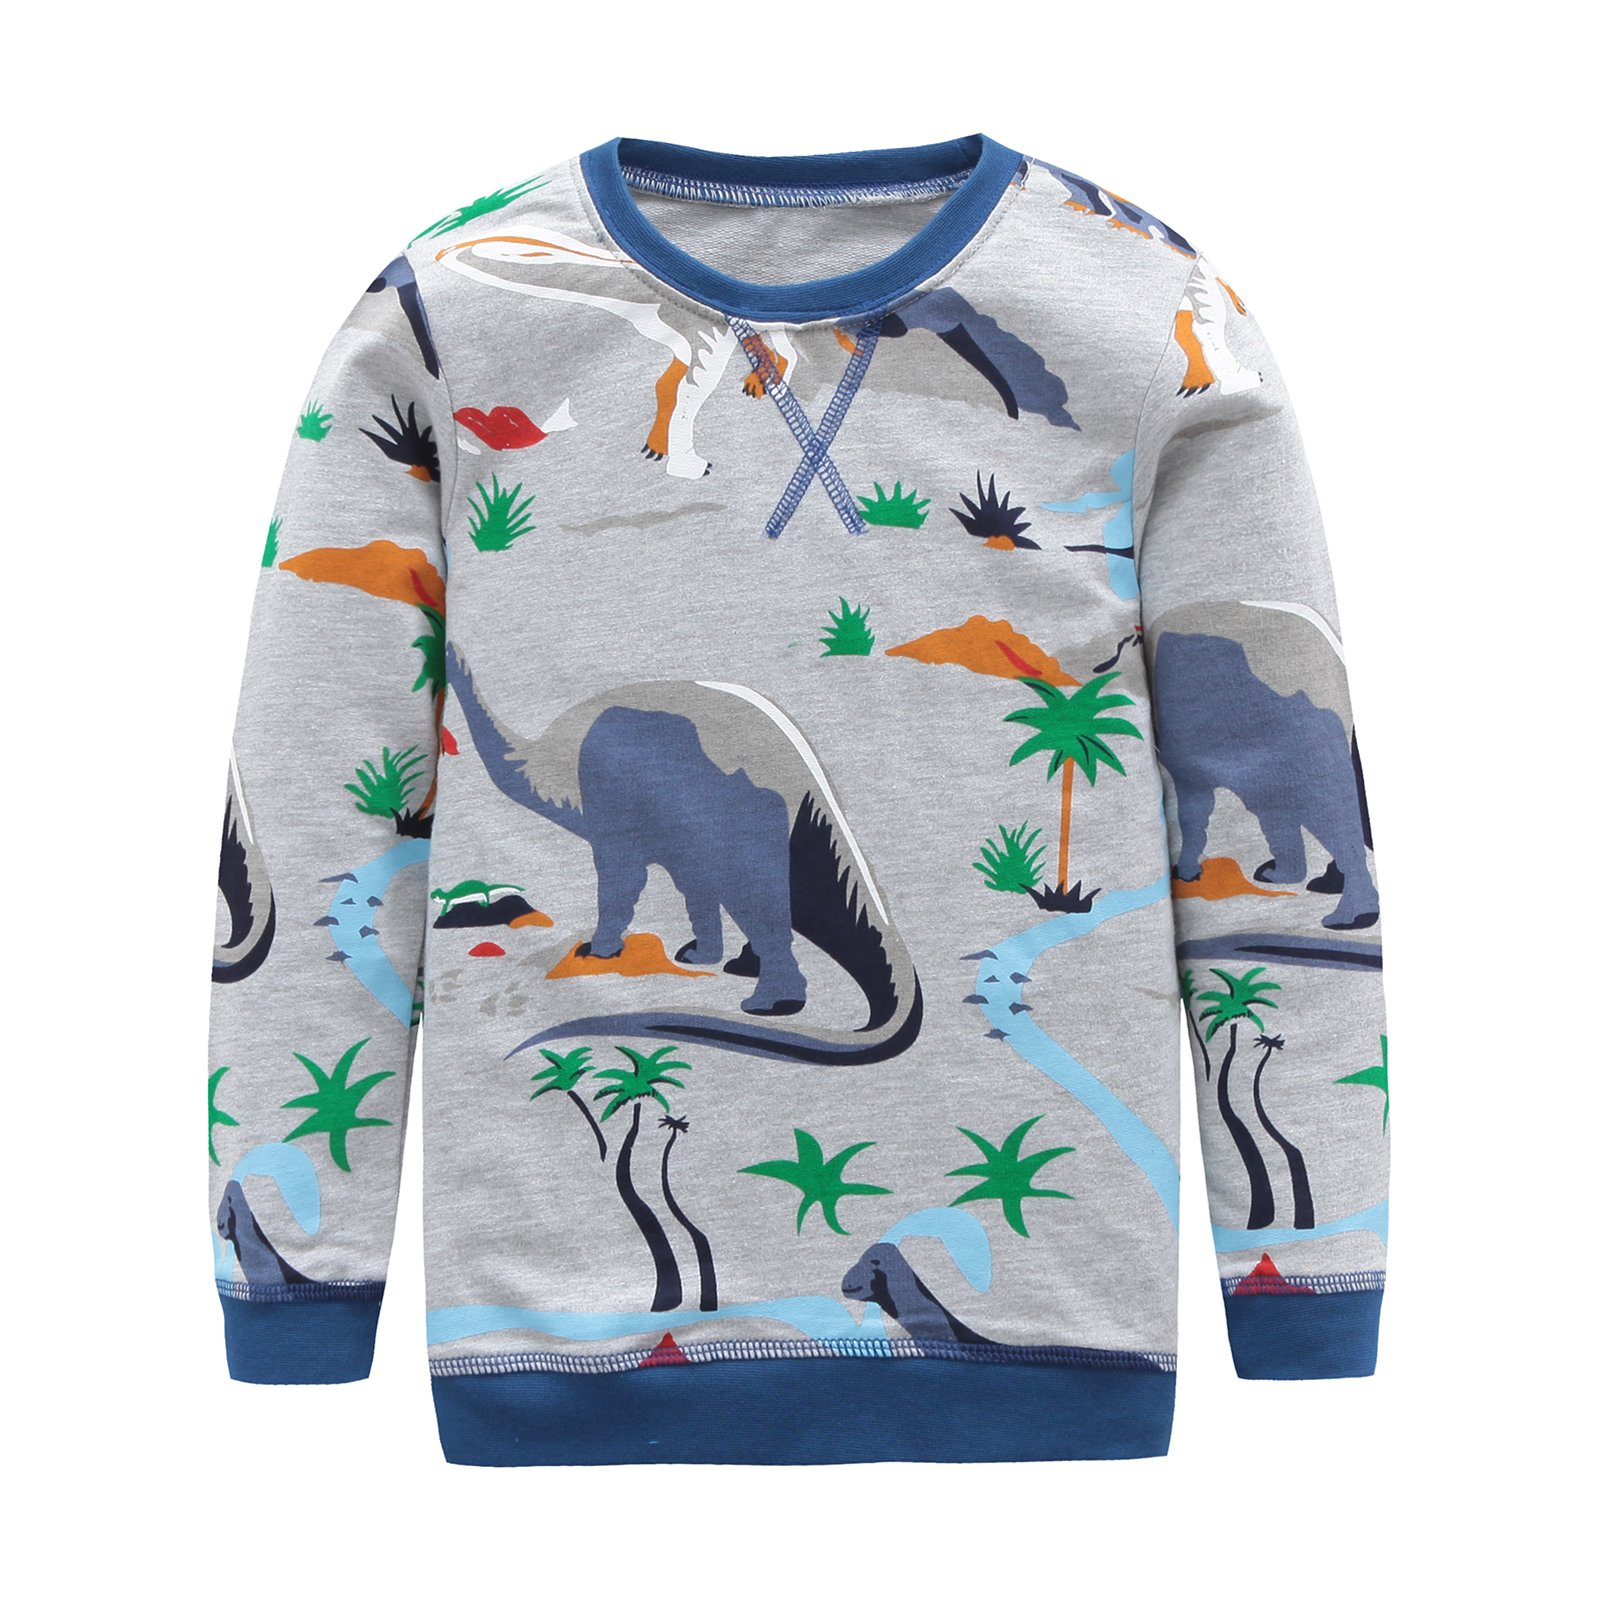 HowJoJo Big Boys Dinosaur Shirts Cotton Long Sleeve T-Shirts Graphic Tees Grey 7T